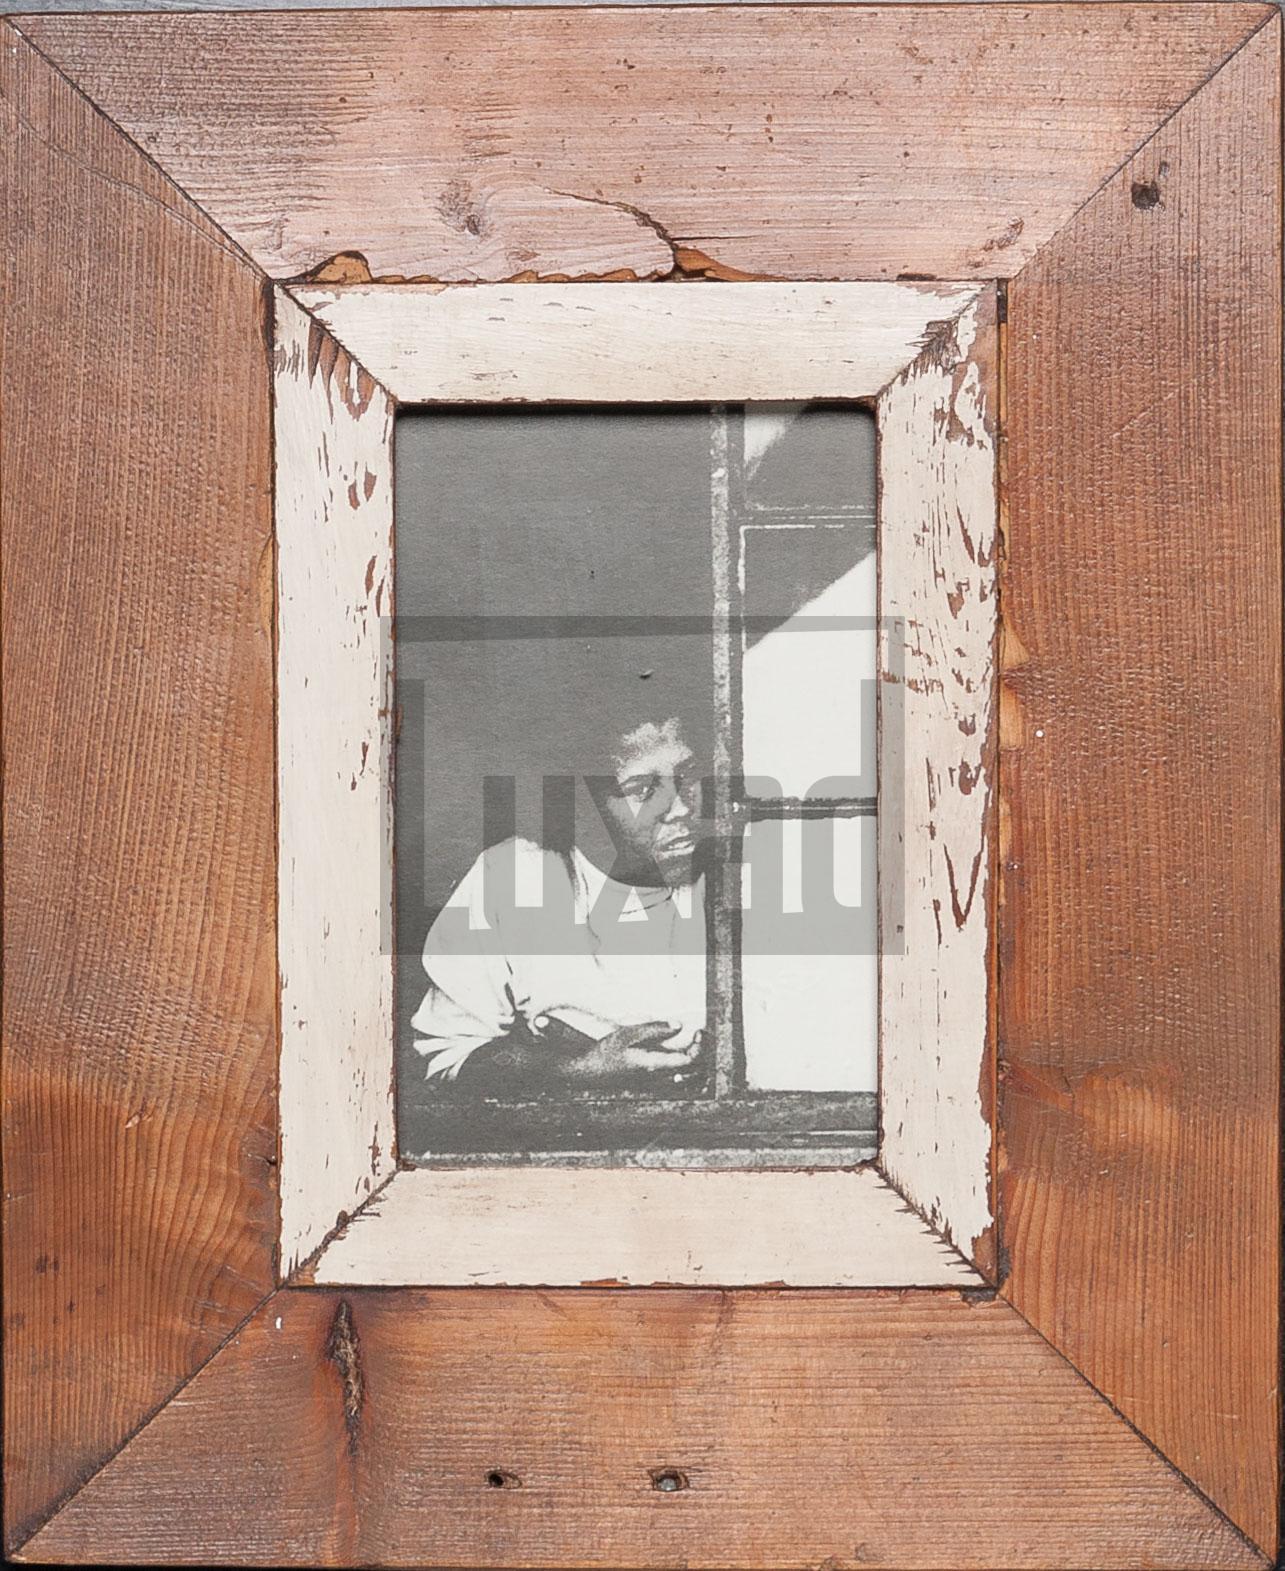 Vintage-Bilderrahmen aus altem Holz für Fotos DIN A6